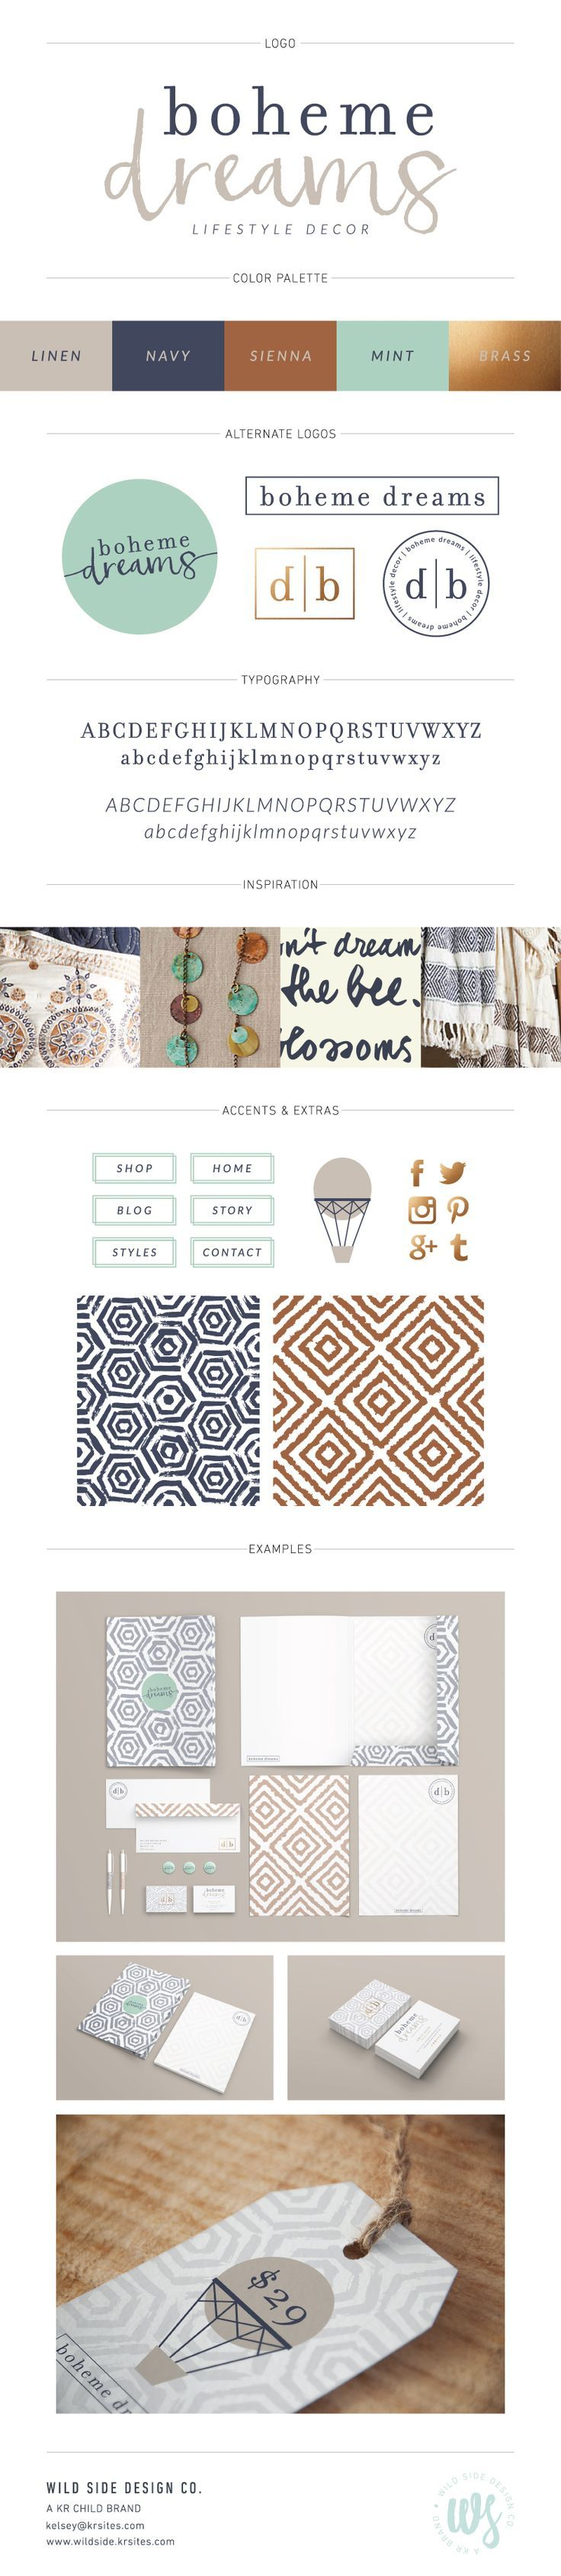 Brand Launch | Brand Style Board | Boho Home Decor Branding | Boheme Dreams Brand Design by Wild Side Design Co. | #brand #print http://www.wildside.krsites.com